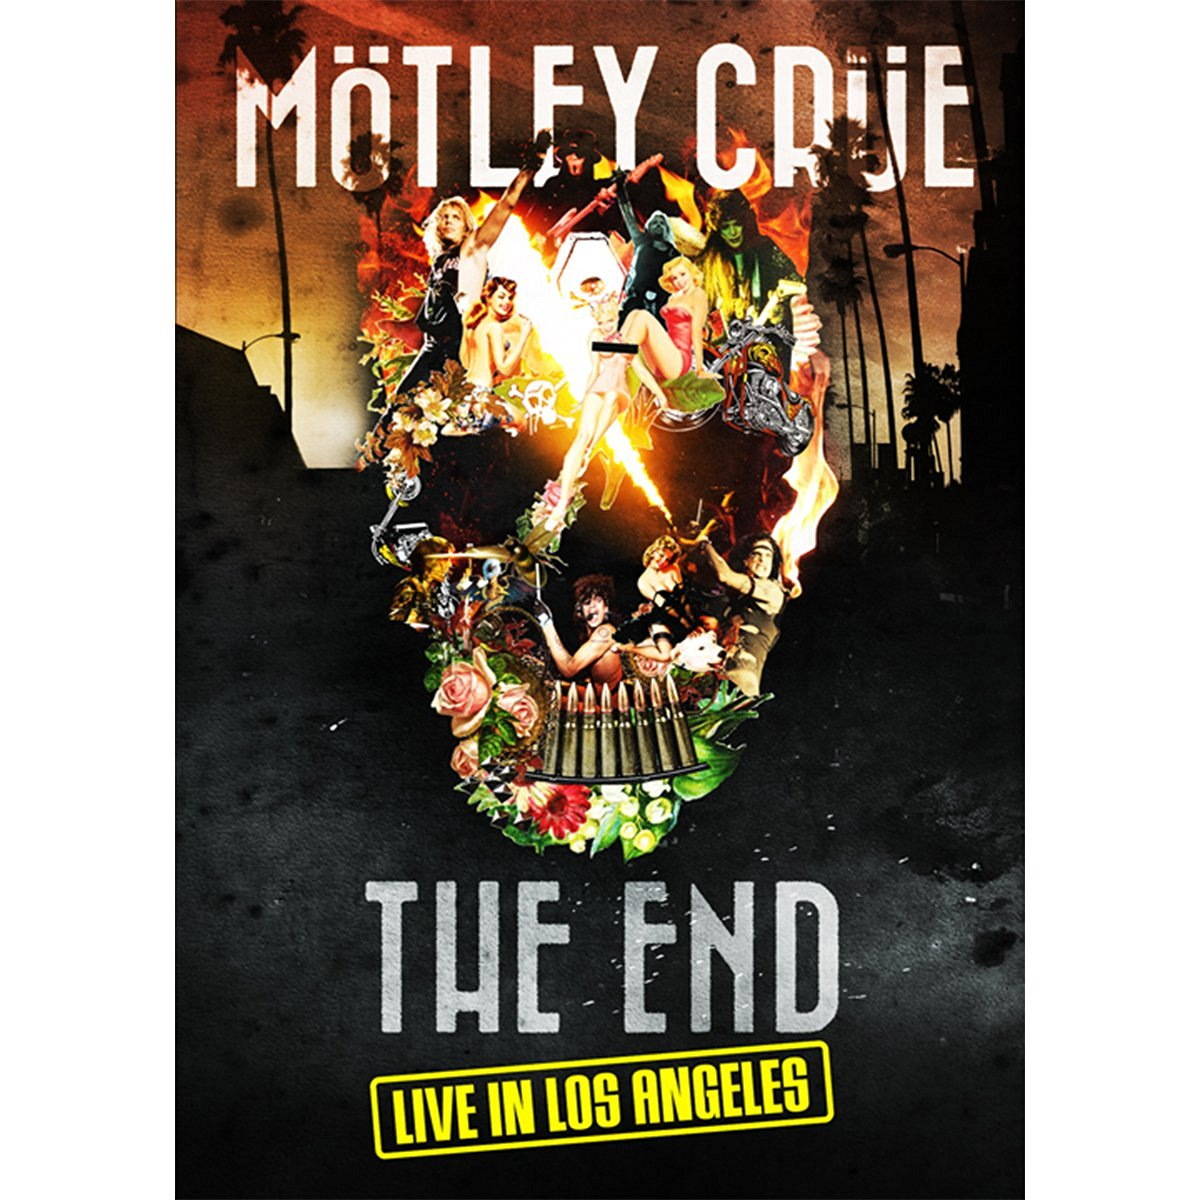 「THE END」ラスト・ライヴ・イン・ロサンゼルス 2015年12月31日+劇場公開ドキュメンタリー映画「THE END」【Blu-ray】 [ モトリー・クルー ]